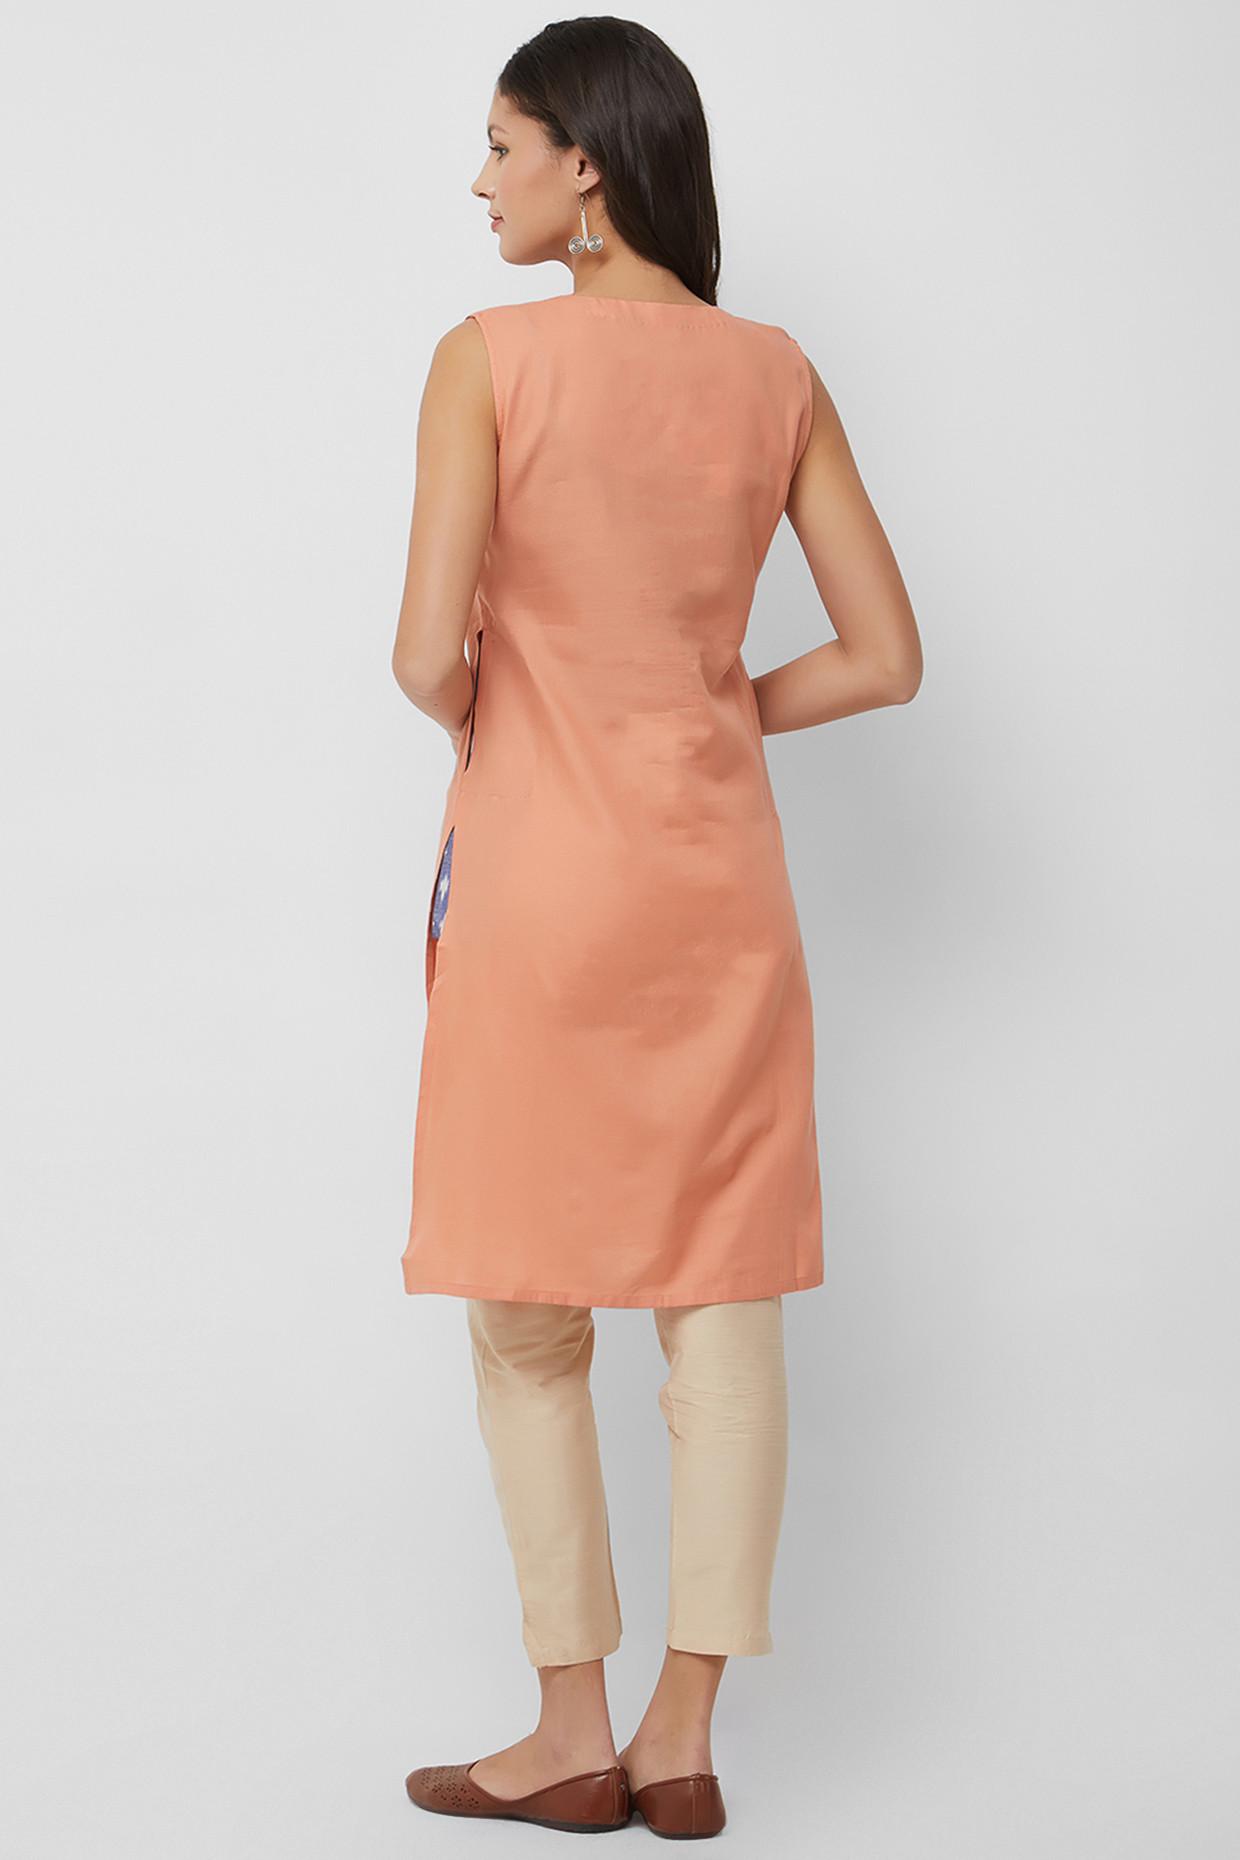 Summer Handloom Cotton Kurti In Rose by House Of Idar